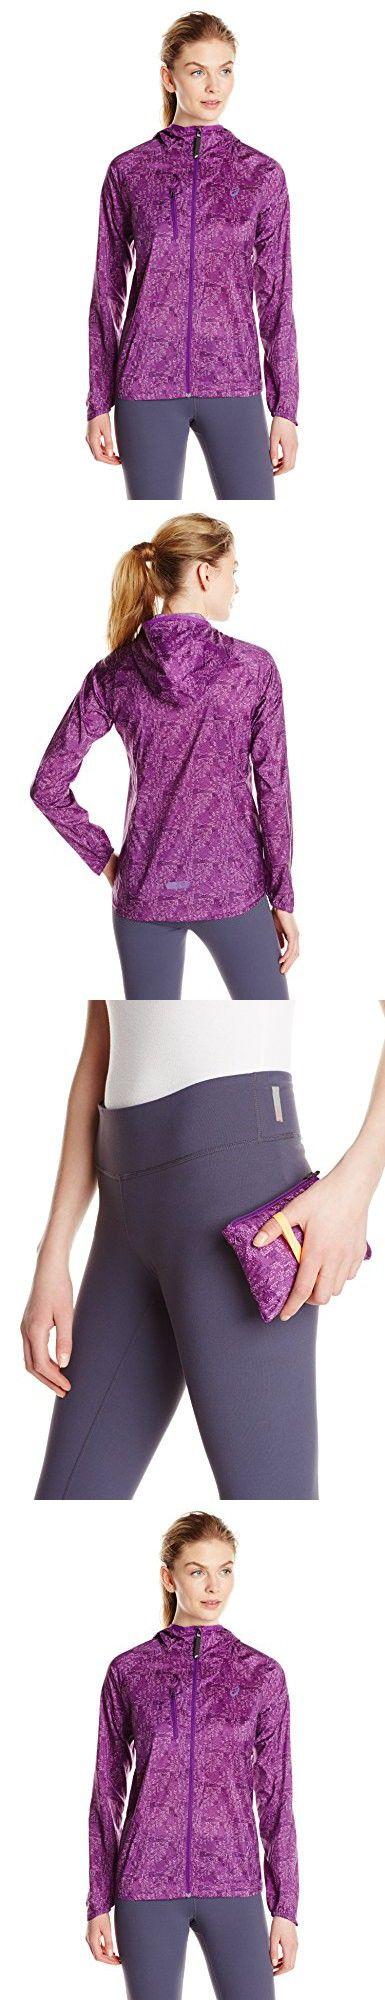 ASICS Women's Fujitrail Packable Jacket, Purple Magic Print, Medium